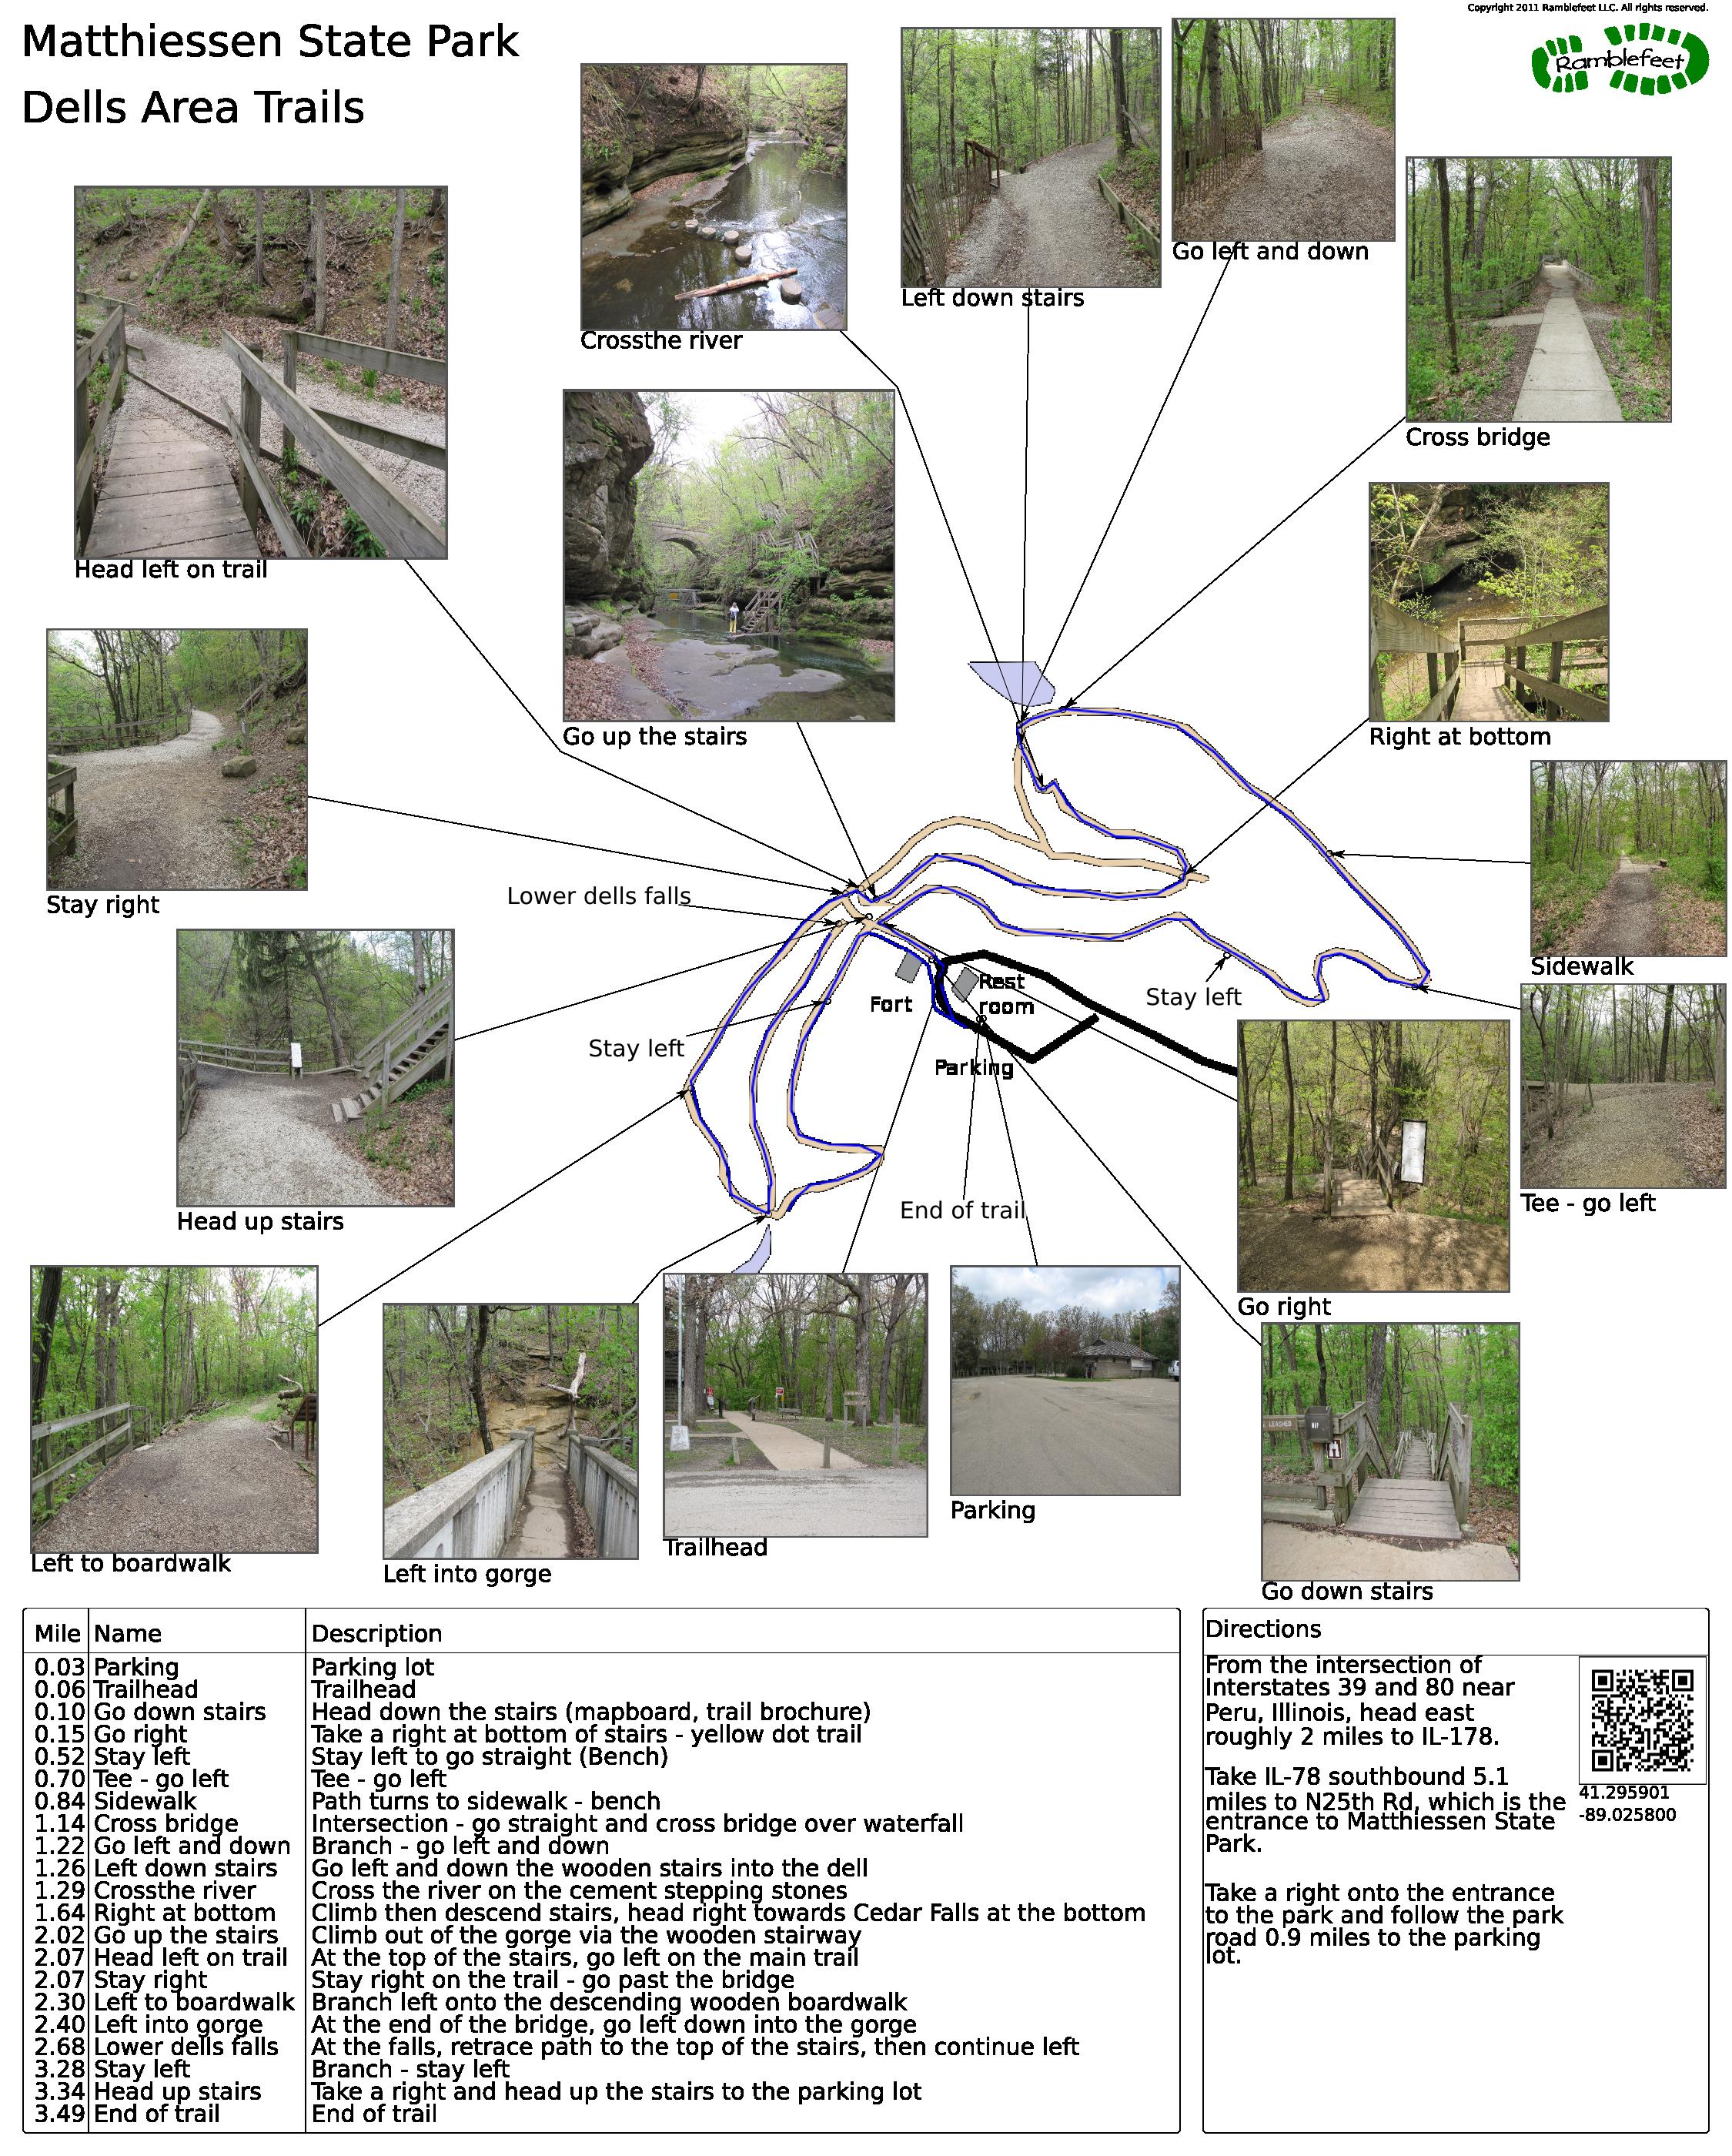 State Parks Illinois Map.Matthiessen State Park Dells Area Trails